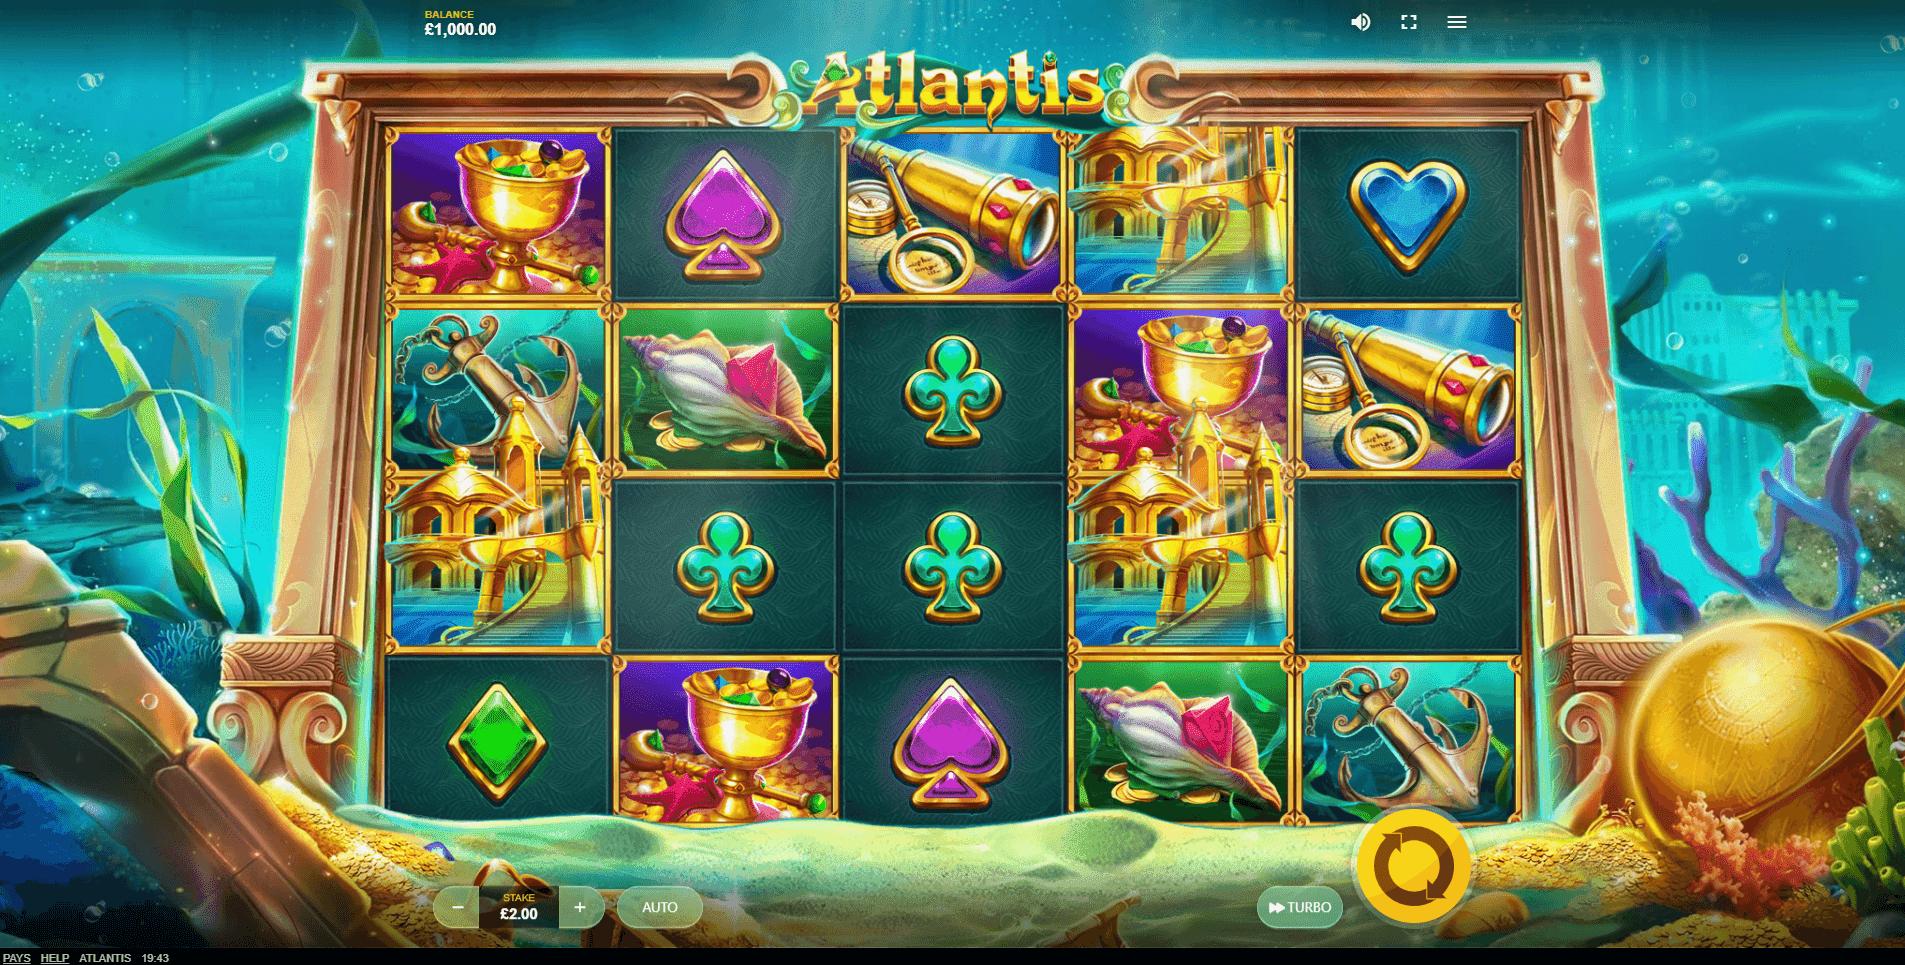 Atlantis slot machine screenshot